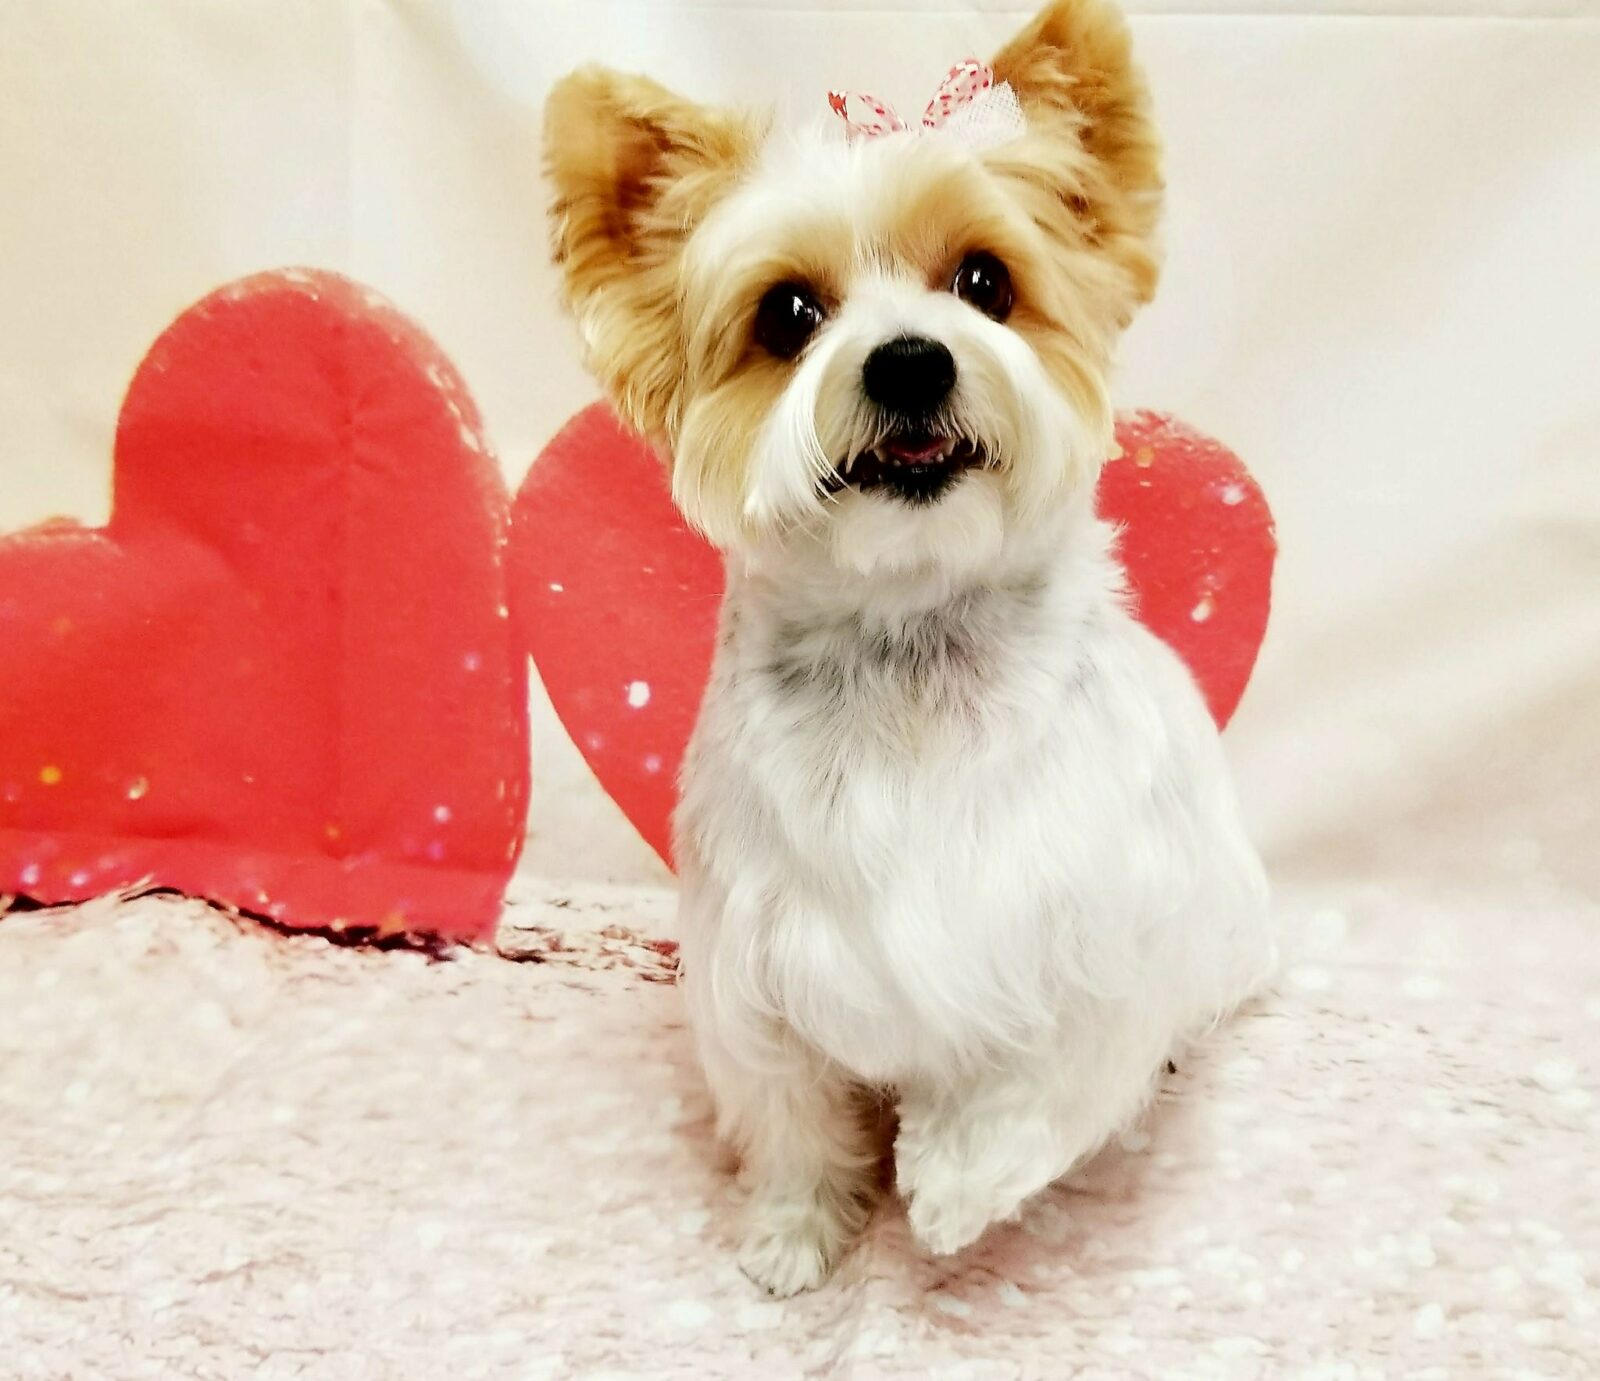 Flea Treatment For Dogs Indiana